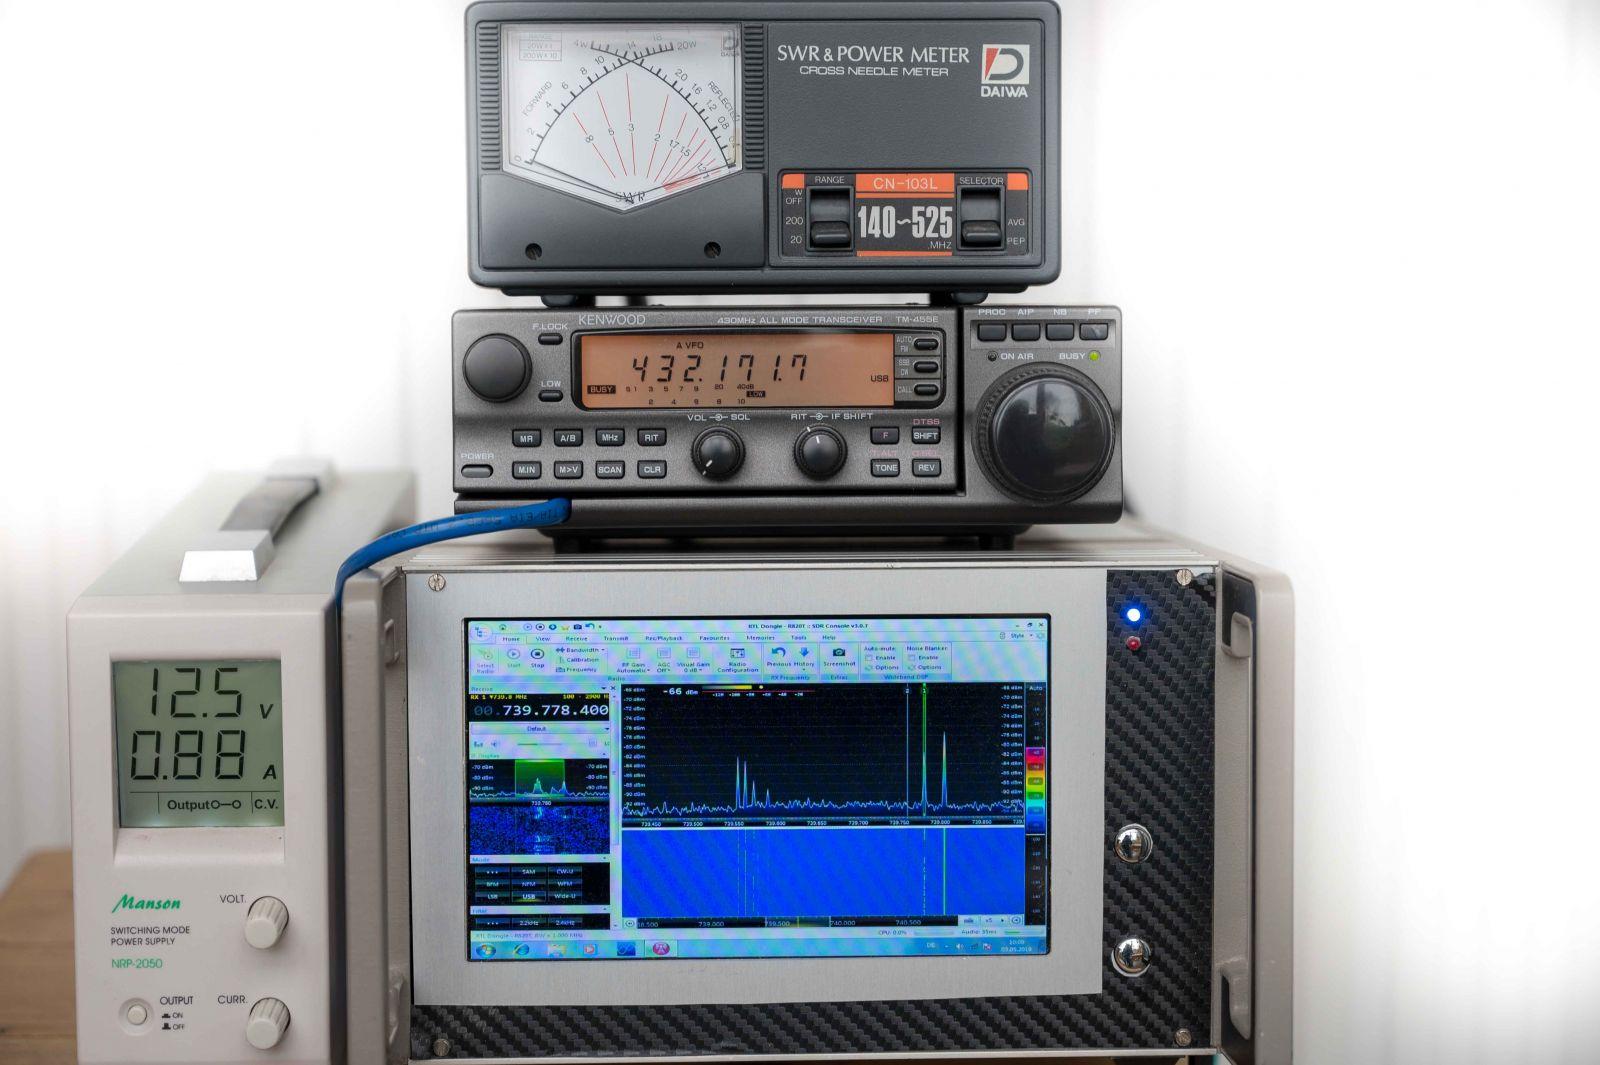 OE5HDM - Callsign Lookup by QRZ Ham Radio